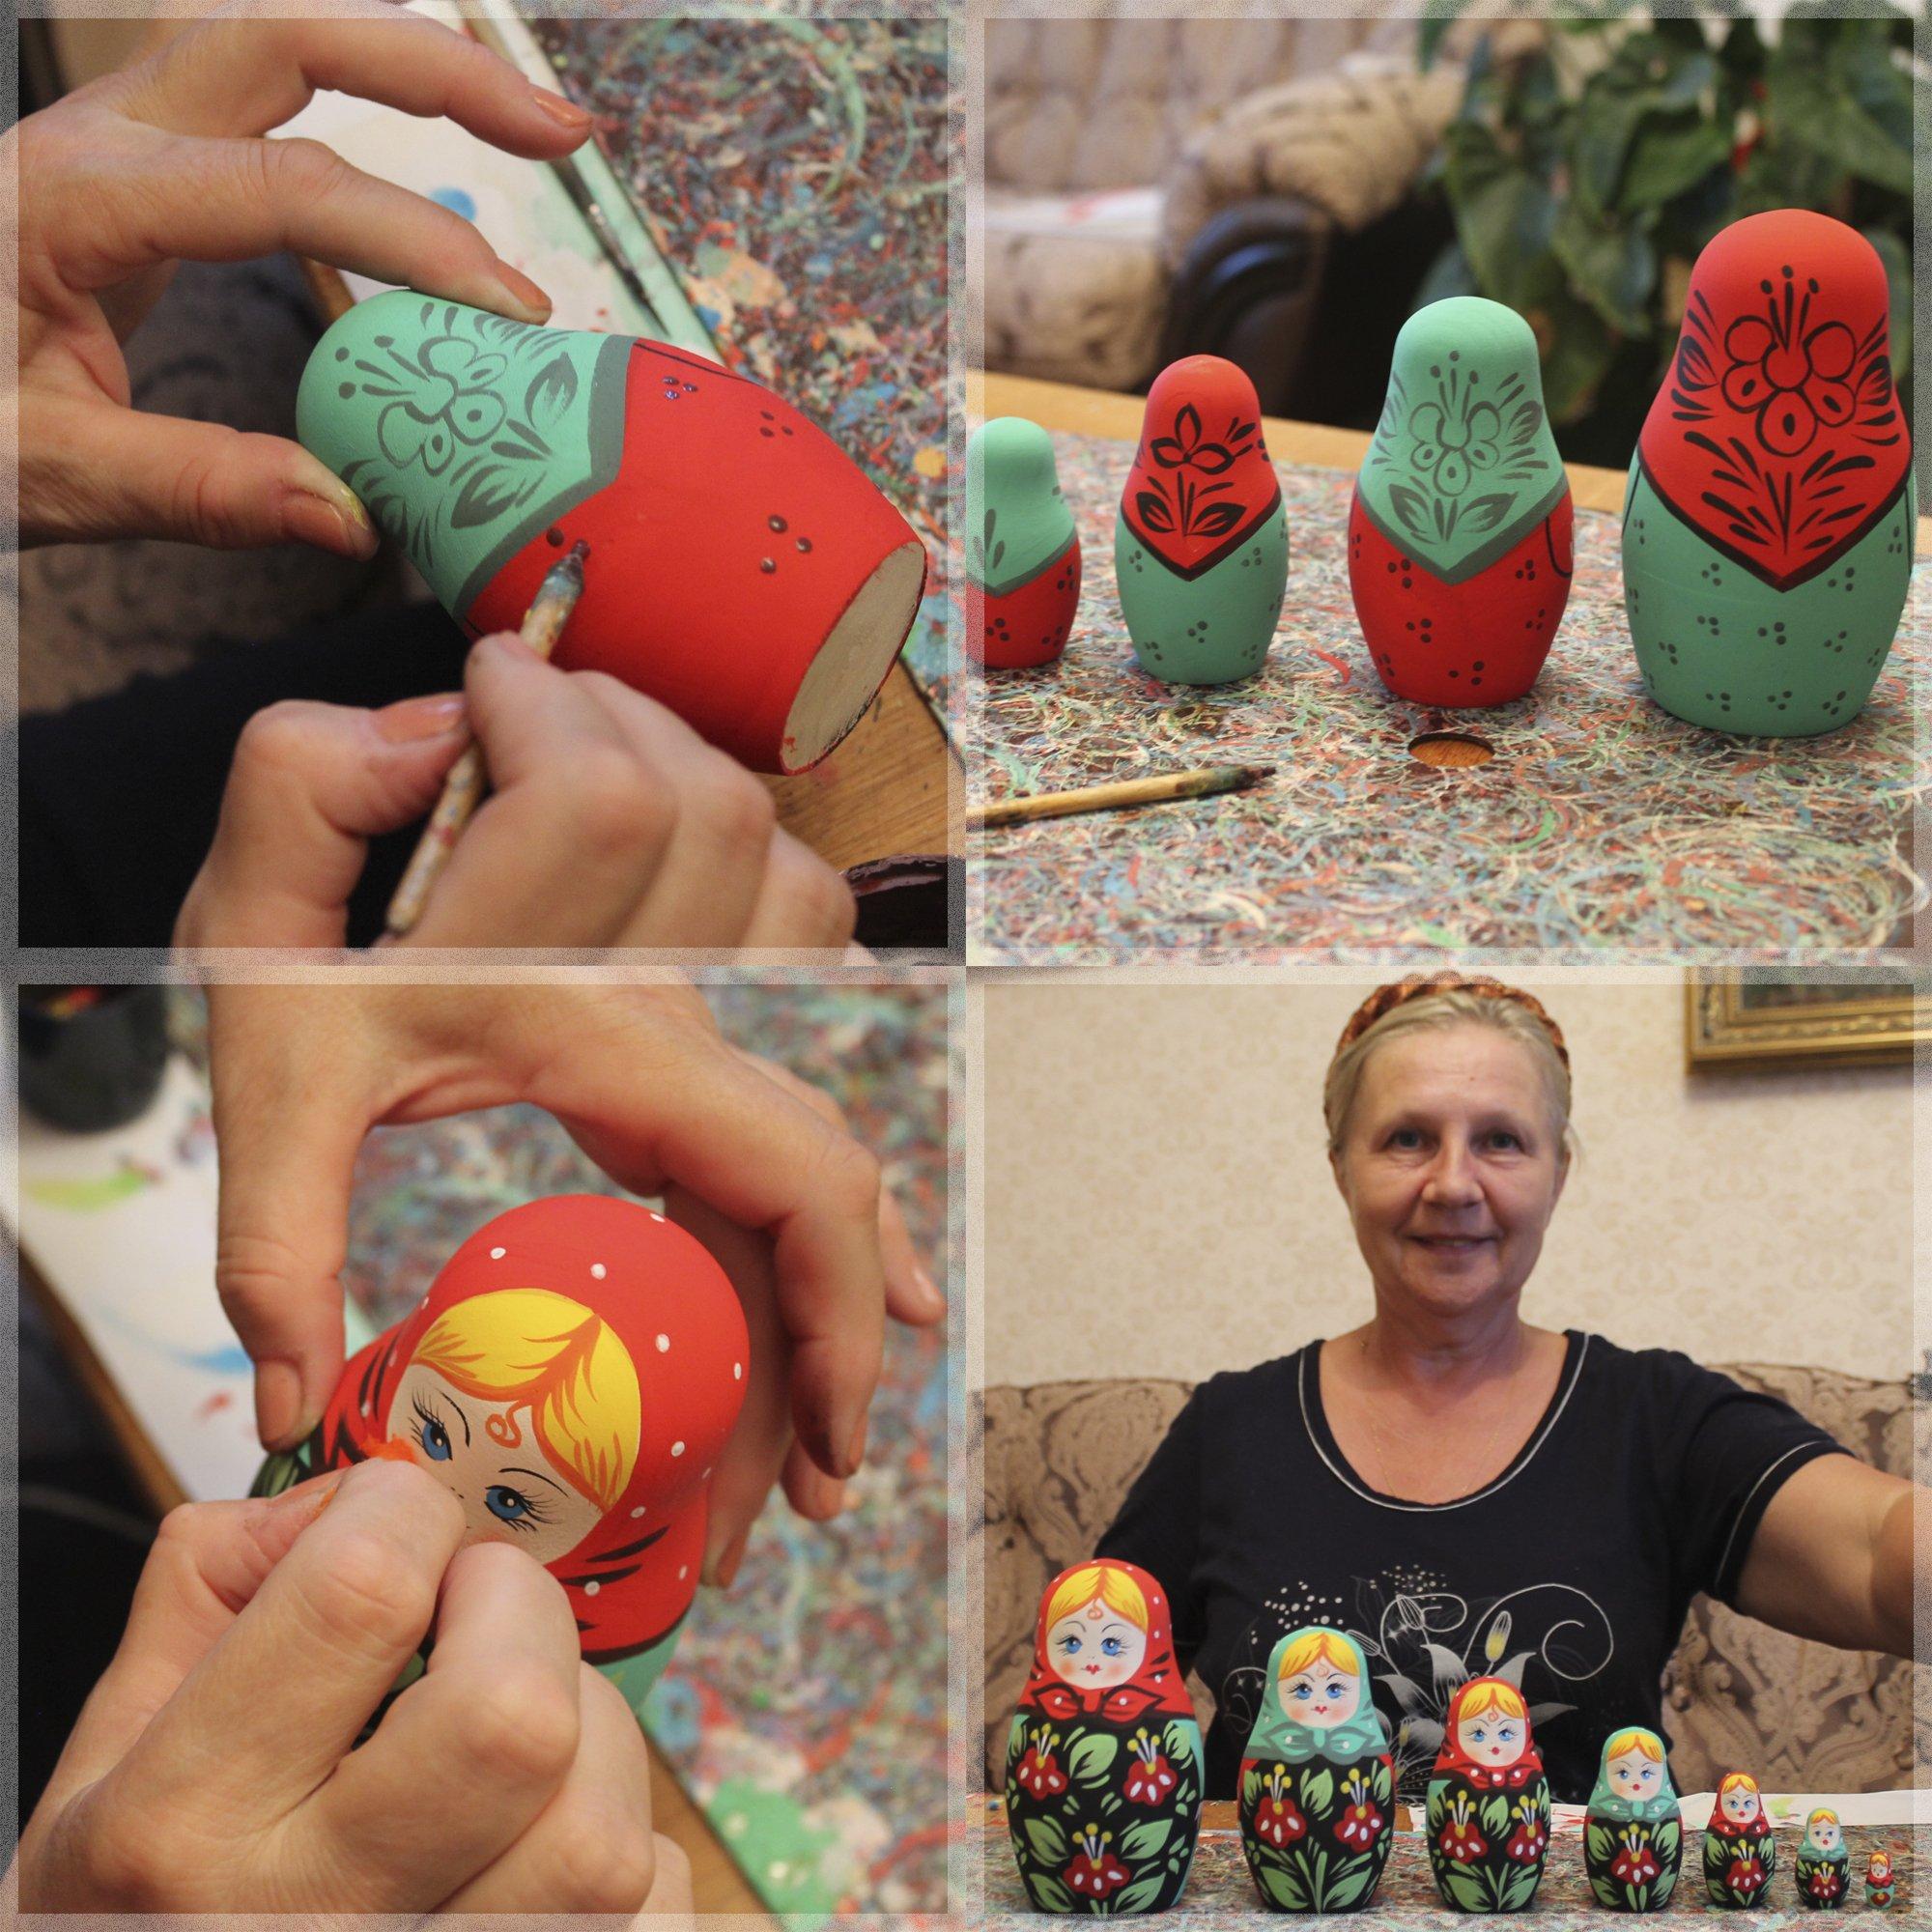 Lot 10 Unpainted Stacking Nesting Dolls Set 4 pcs - DIY Gifts by MATRYOSHKA&HANDICRAFT (Image #4)